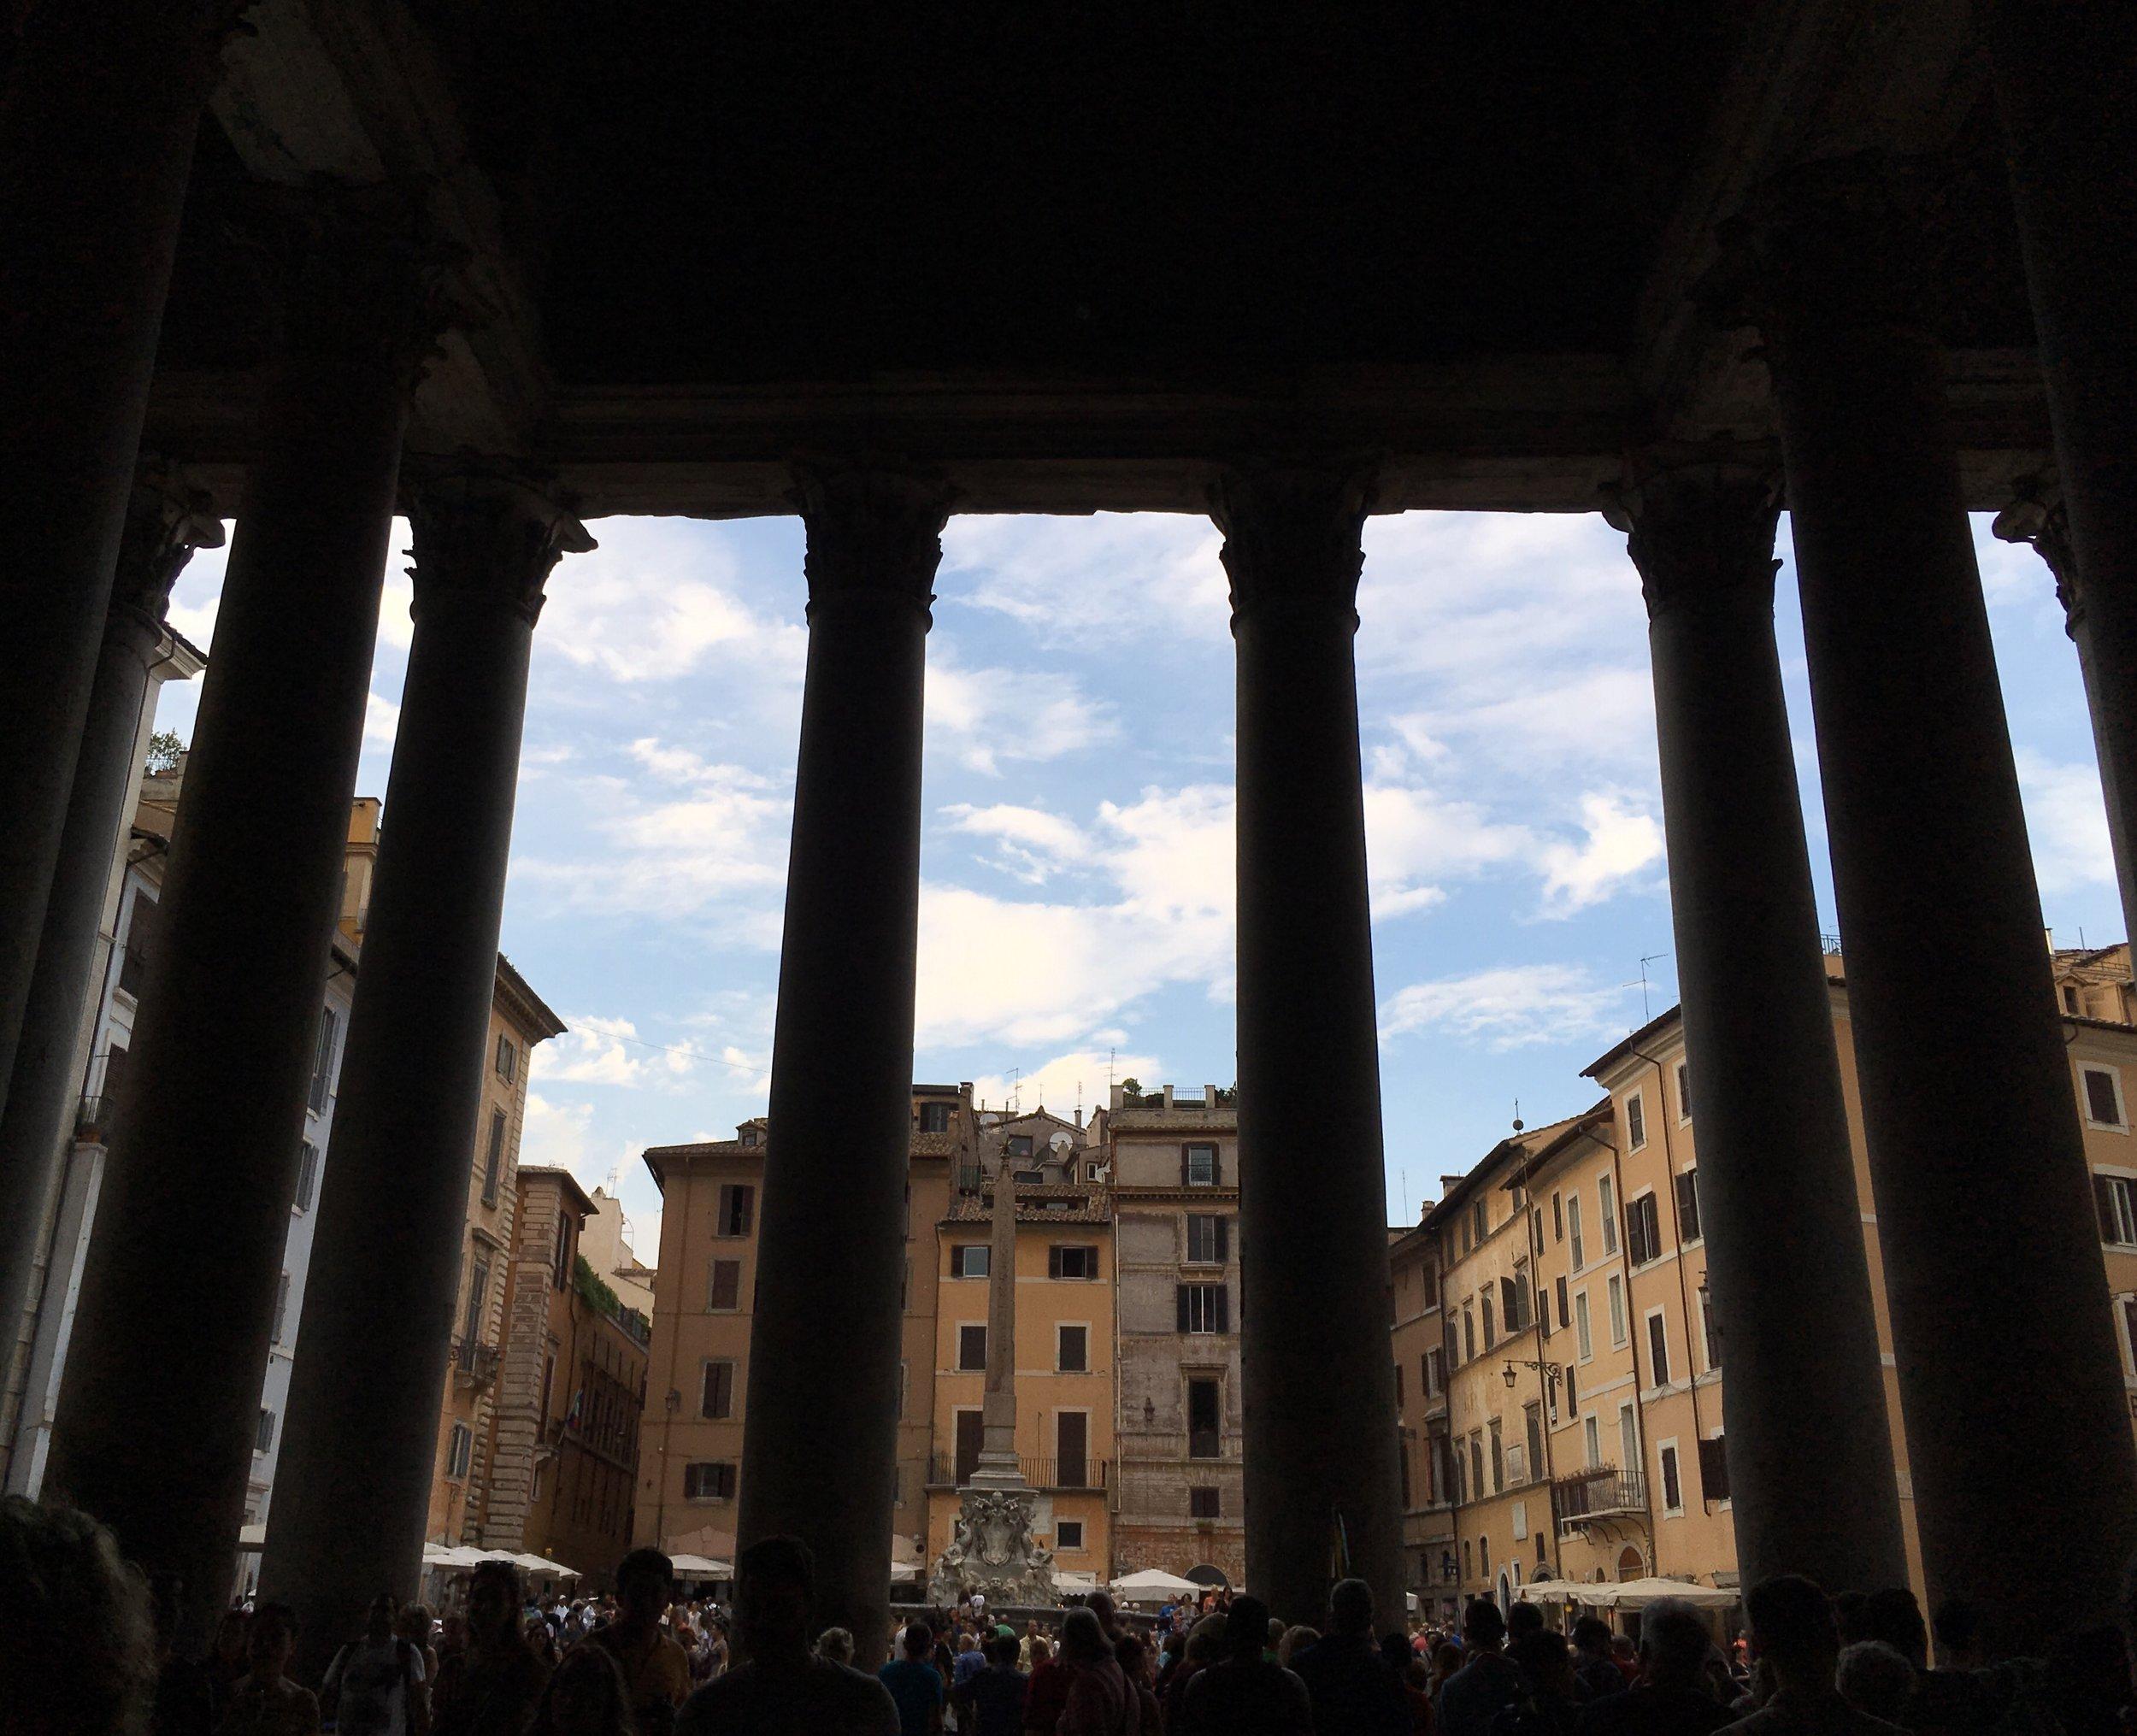 Exiting the Pantheon.